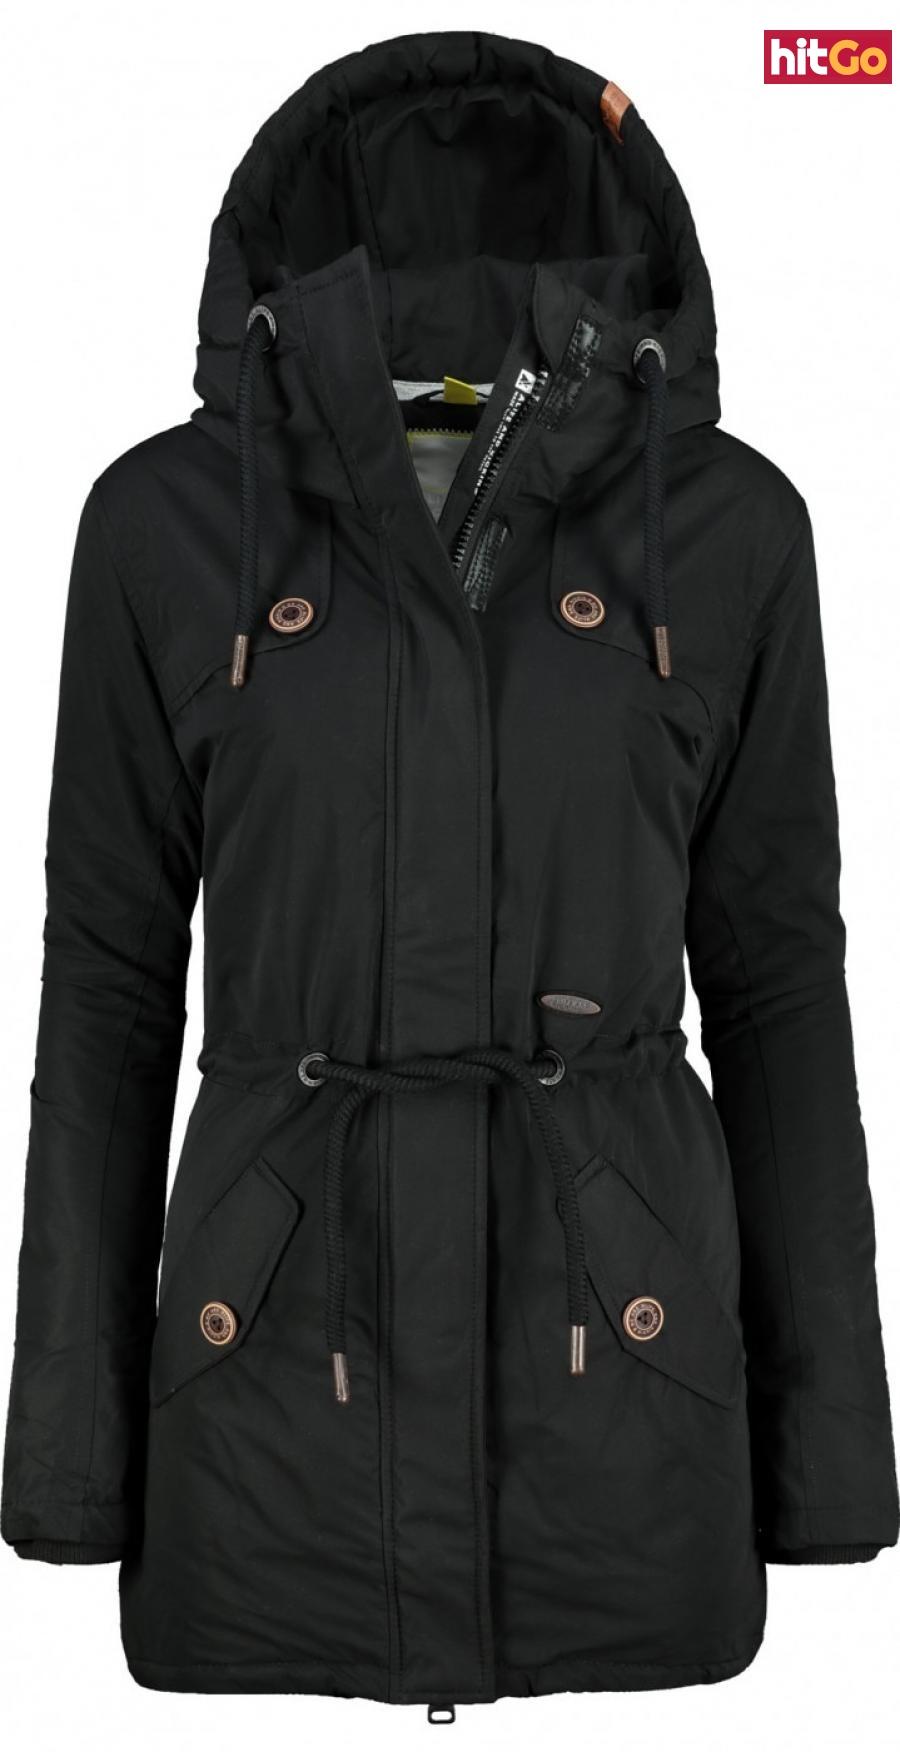 Womens jacket Alife and Kickin Charlotte C dámské Moonless XS